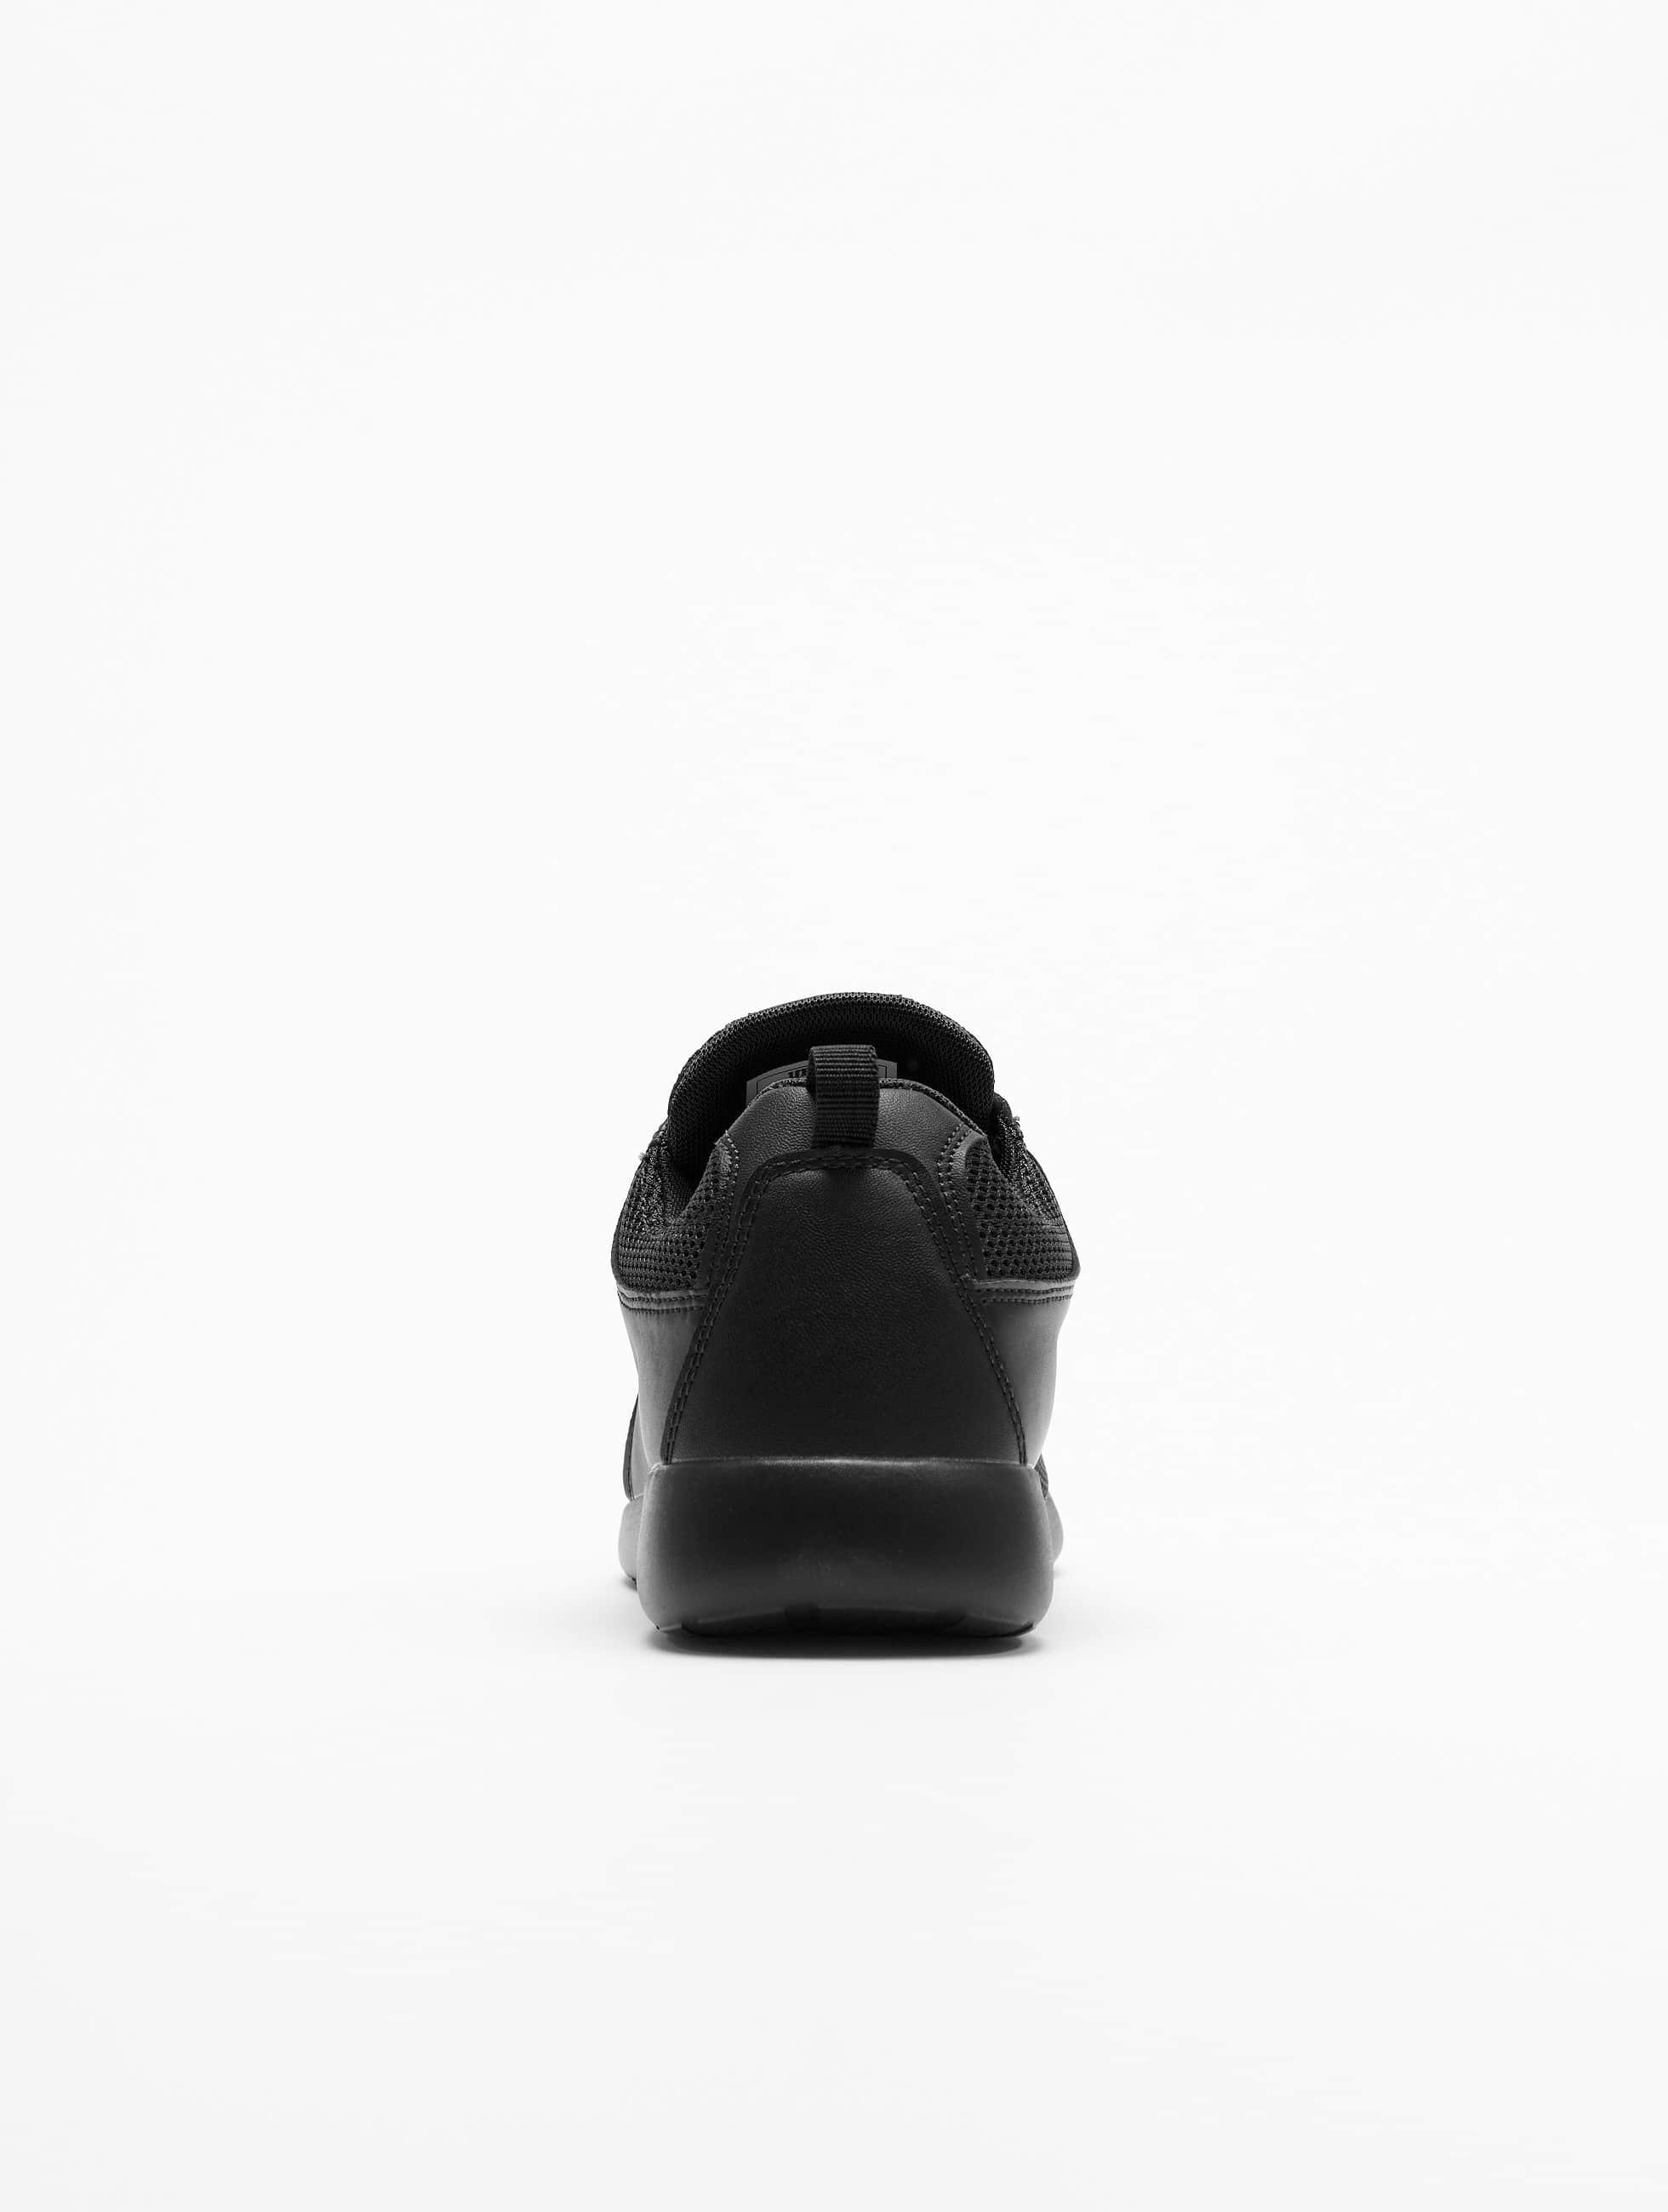 Urban Classics Sneakers Light Runner S black